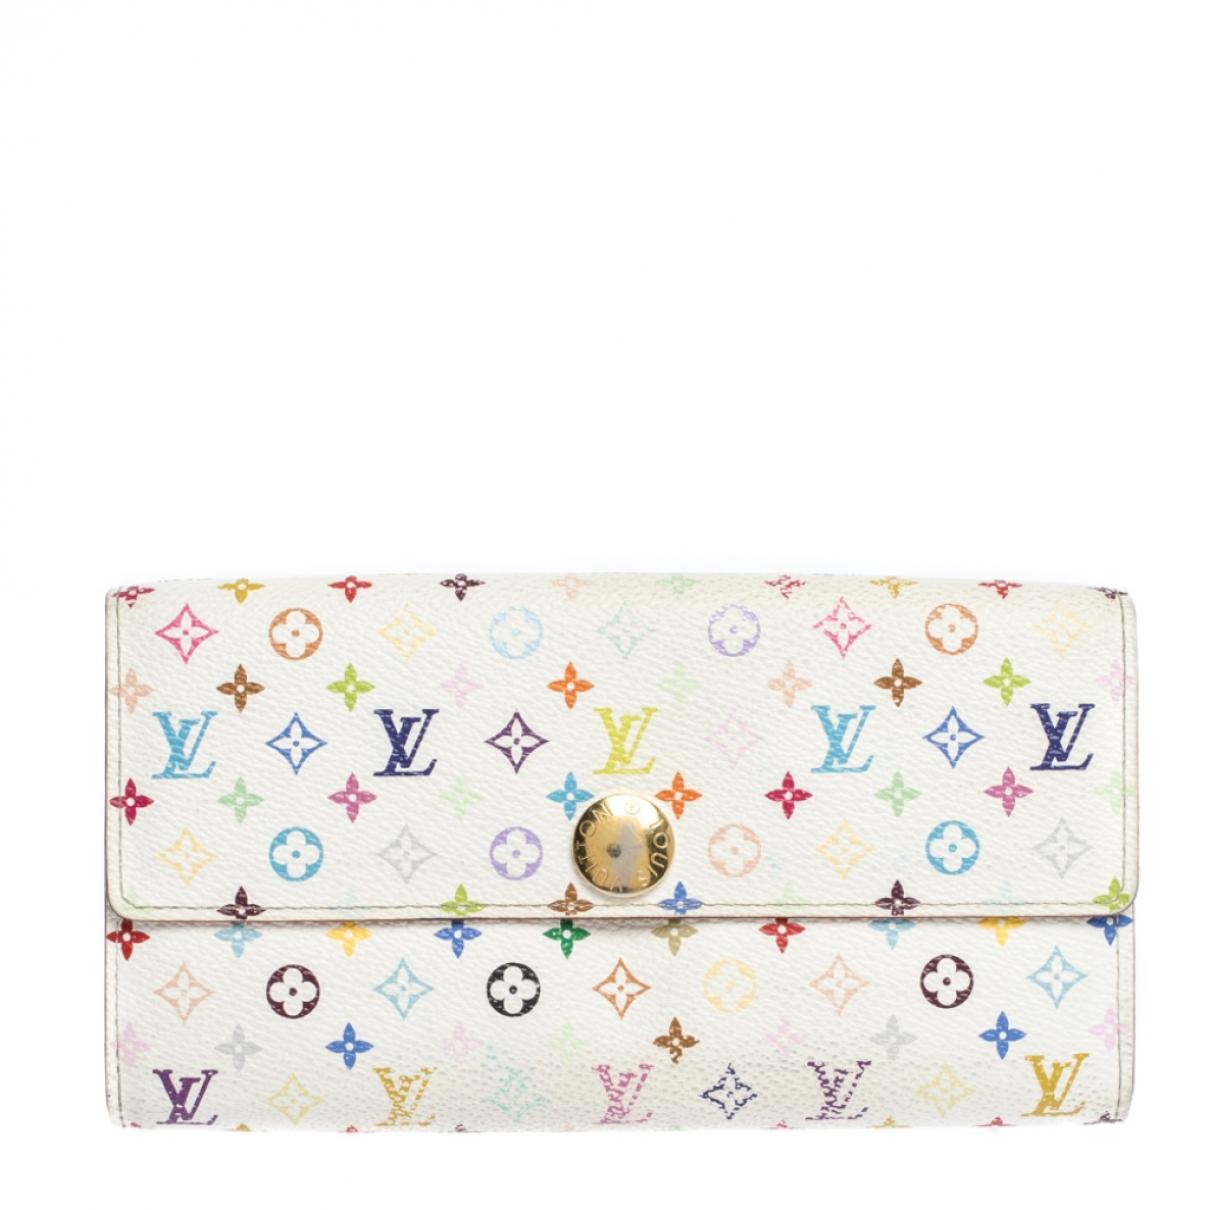 Louis Vuitton Sarah White Leather wallet for Women N